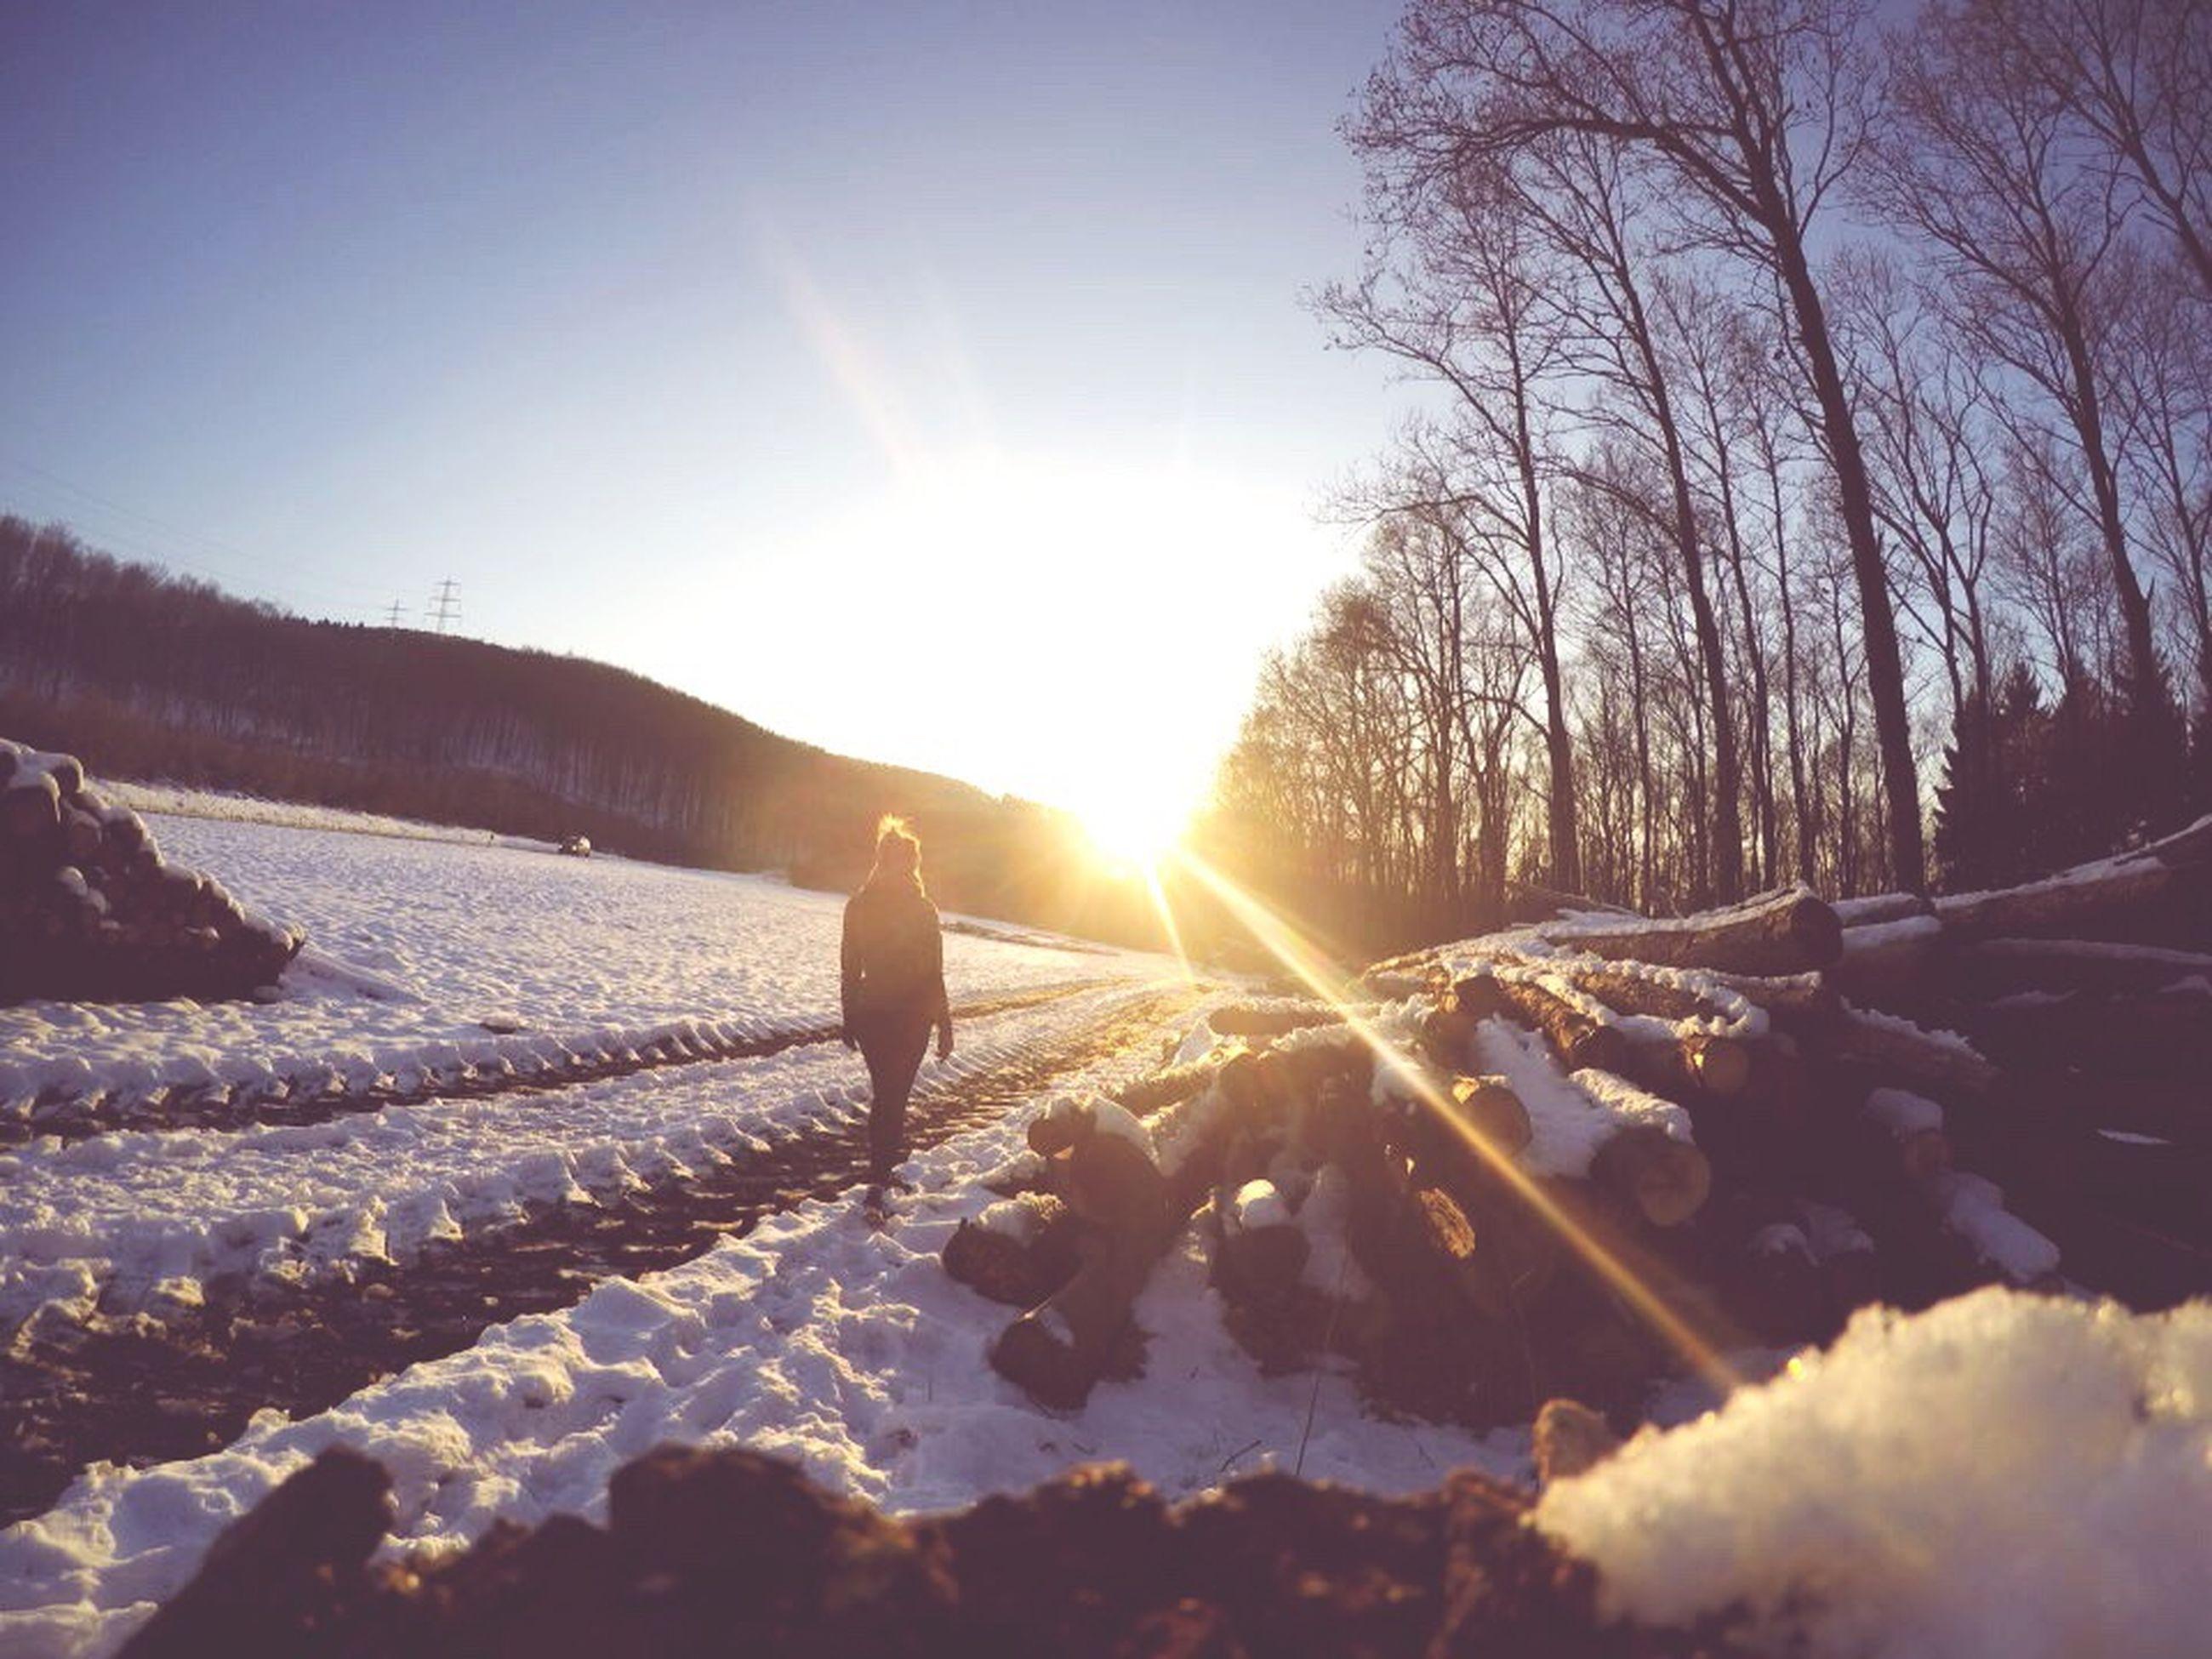 snow, winter, cold temperature, sun, season, sunlight, sunbeam, tranquil scene, tranquility, landscape, silhouette, nature, weather, full length, lens flare, lifestyles, sky, leisure activity